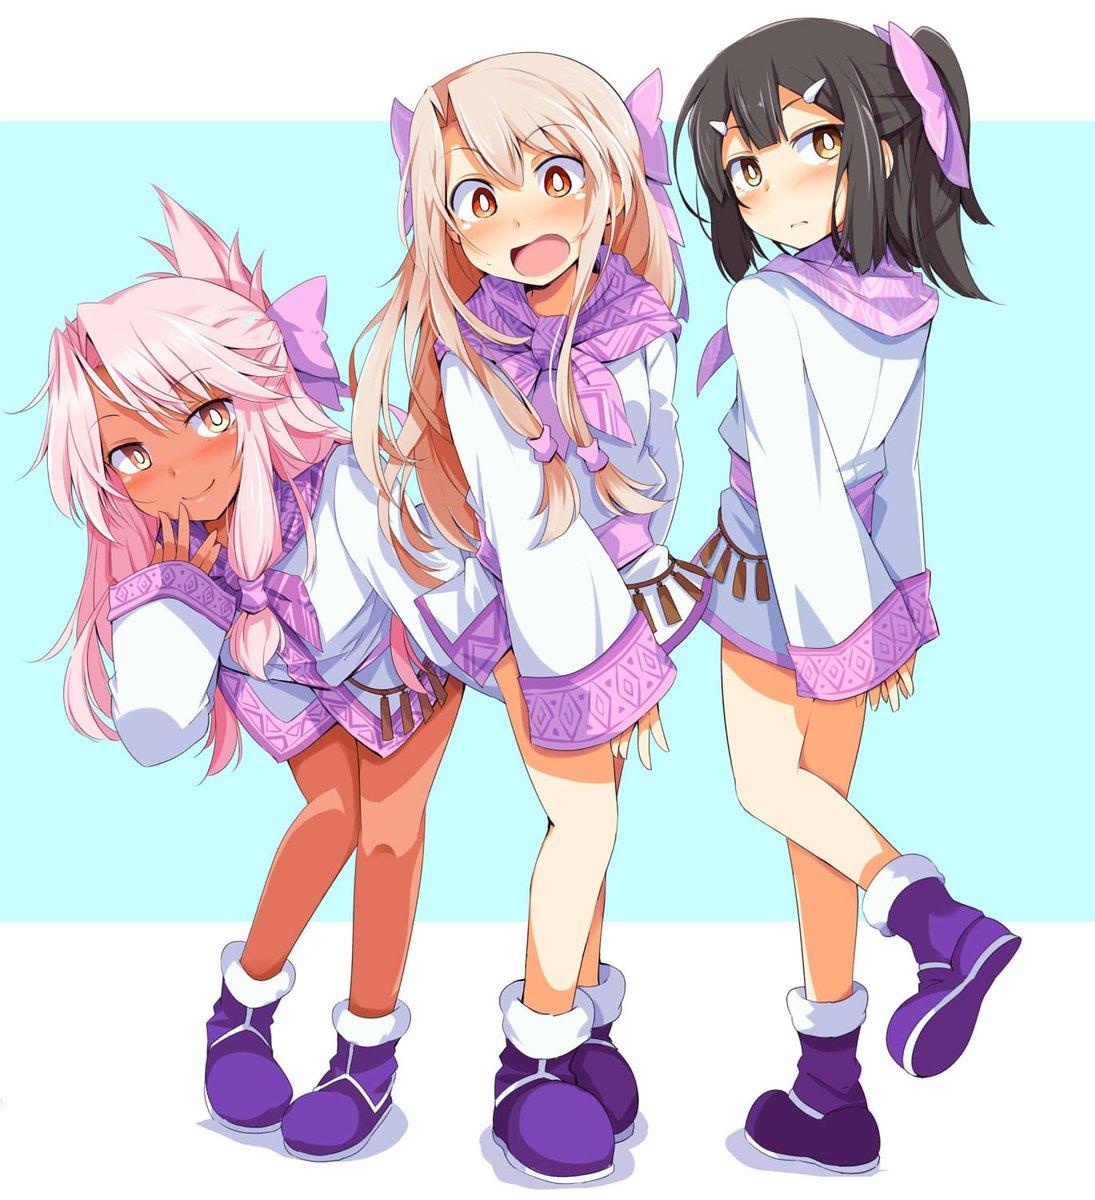 [FGO] それぞれのリアクションも良いプリズマ・シトナイ3姉妹!!